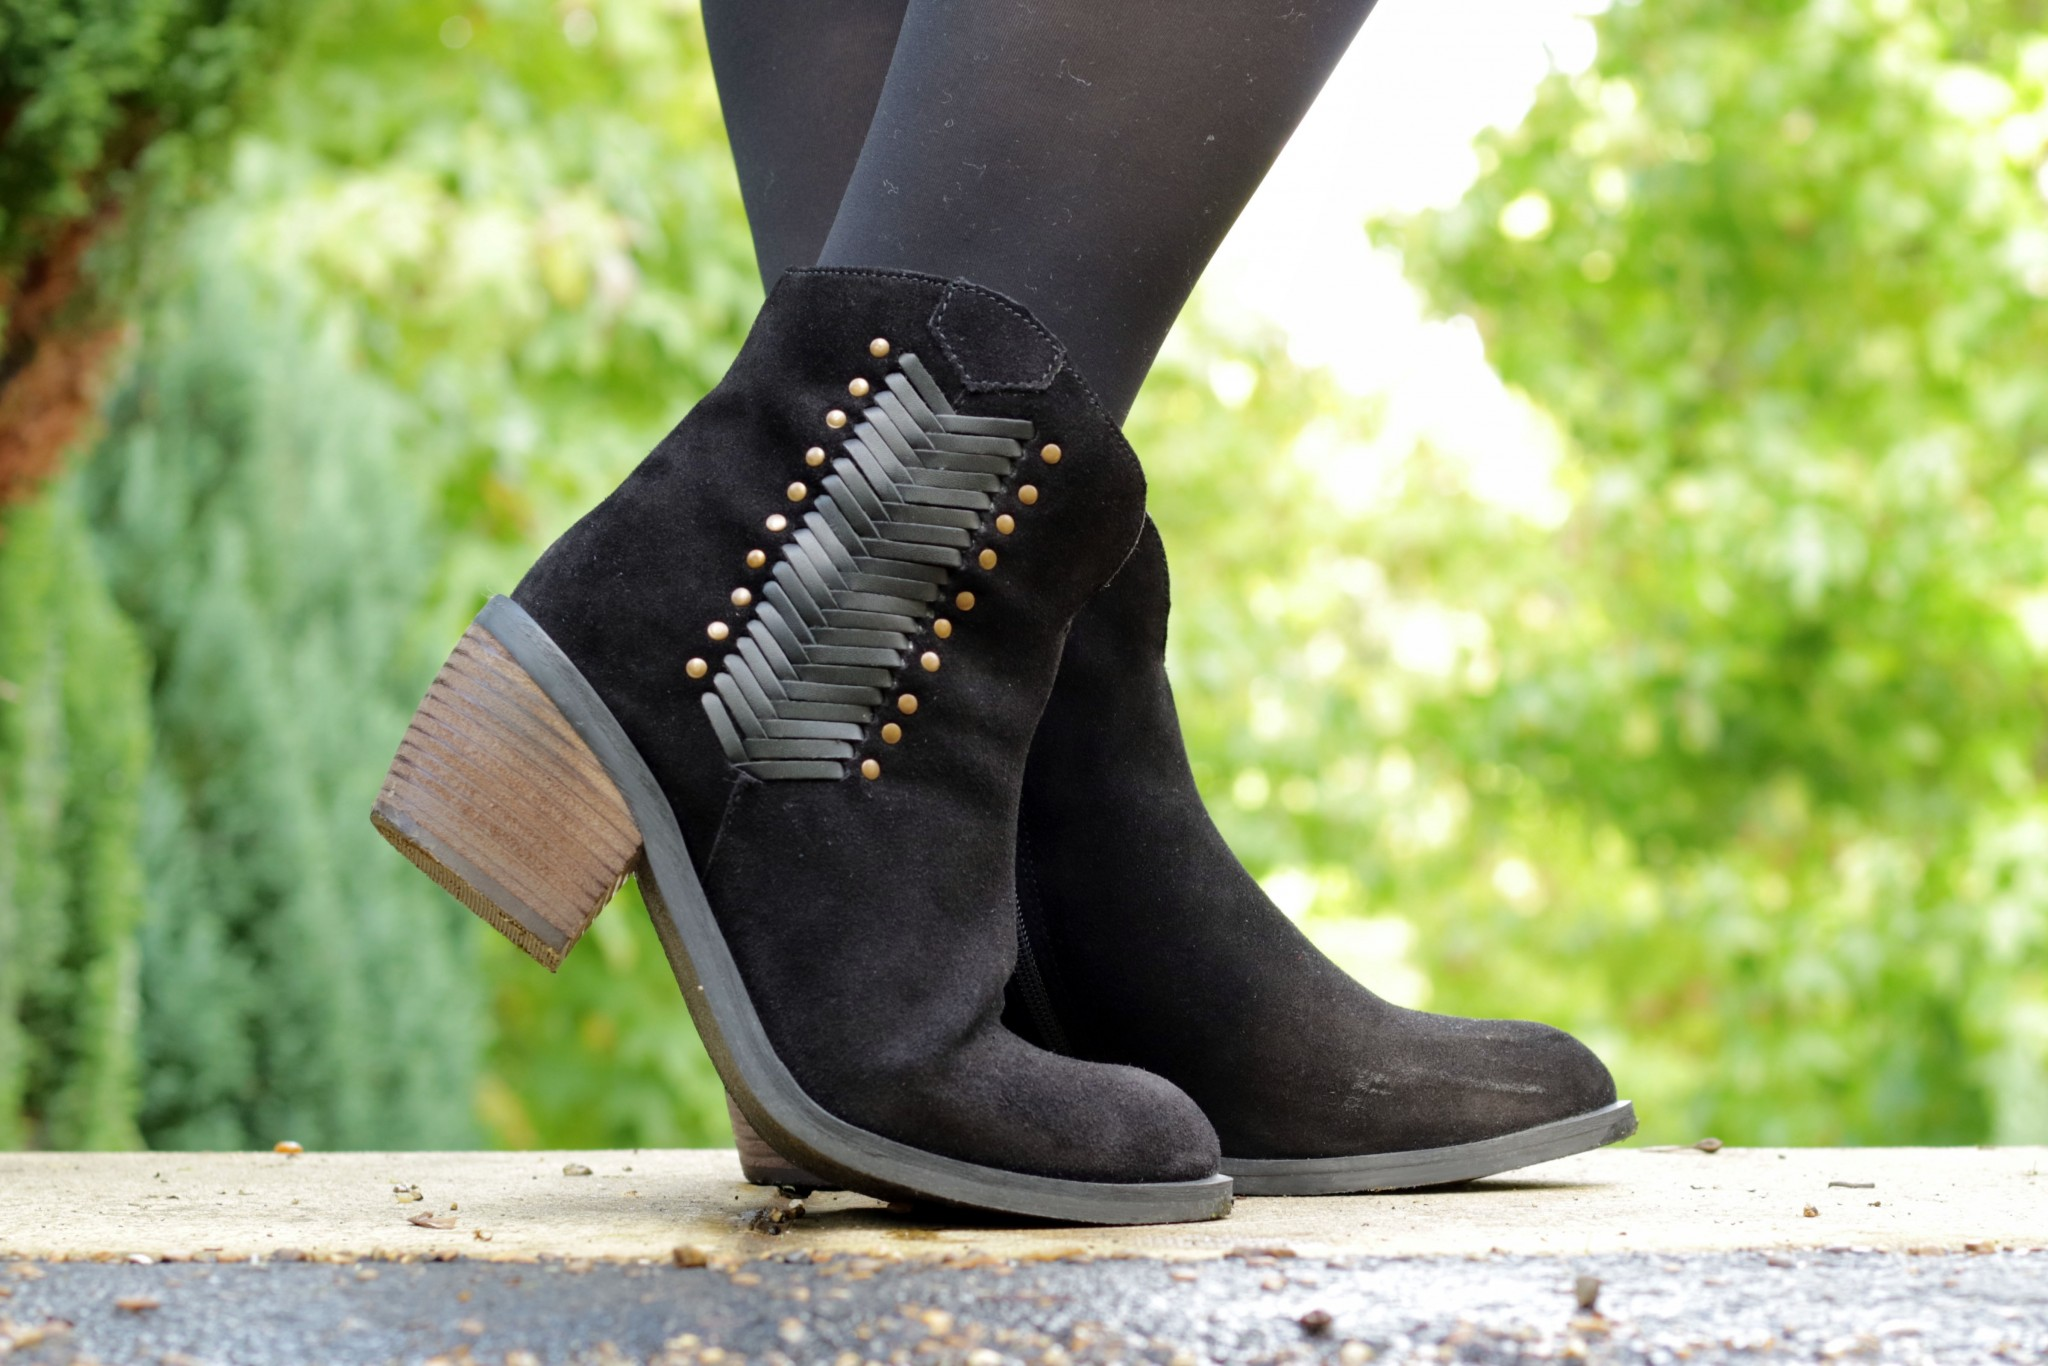 Western Inspired Suede Boots Prettygreentea